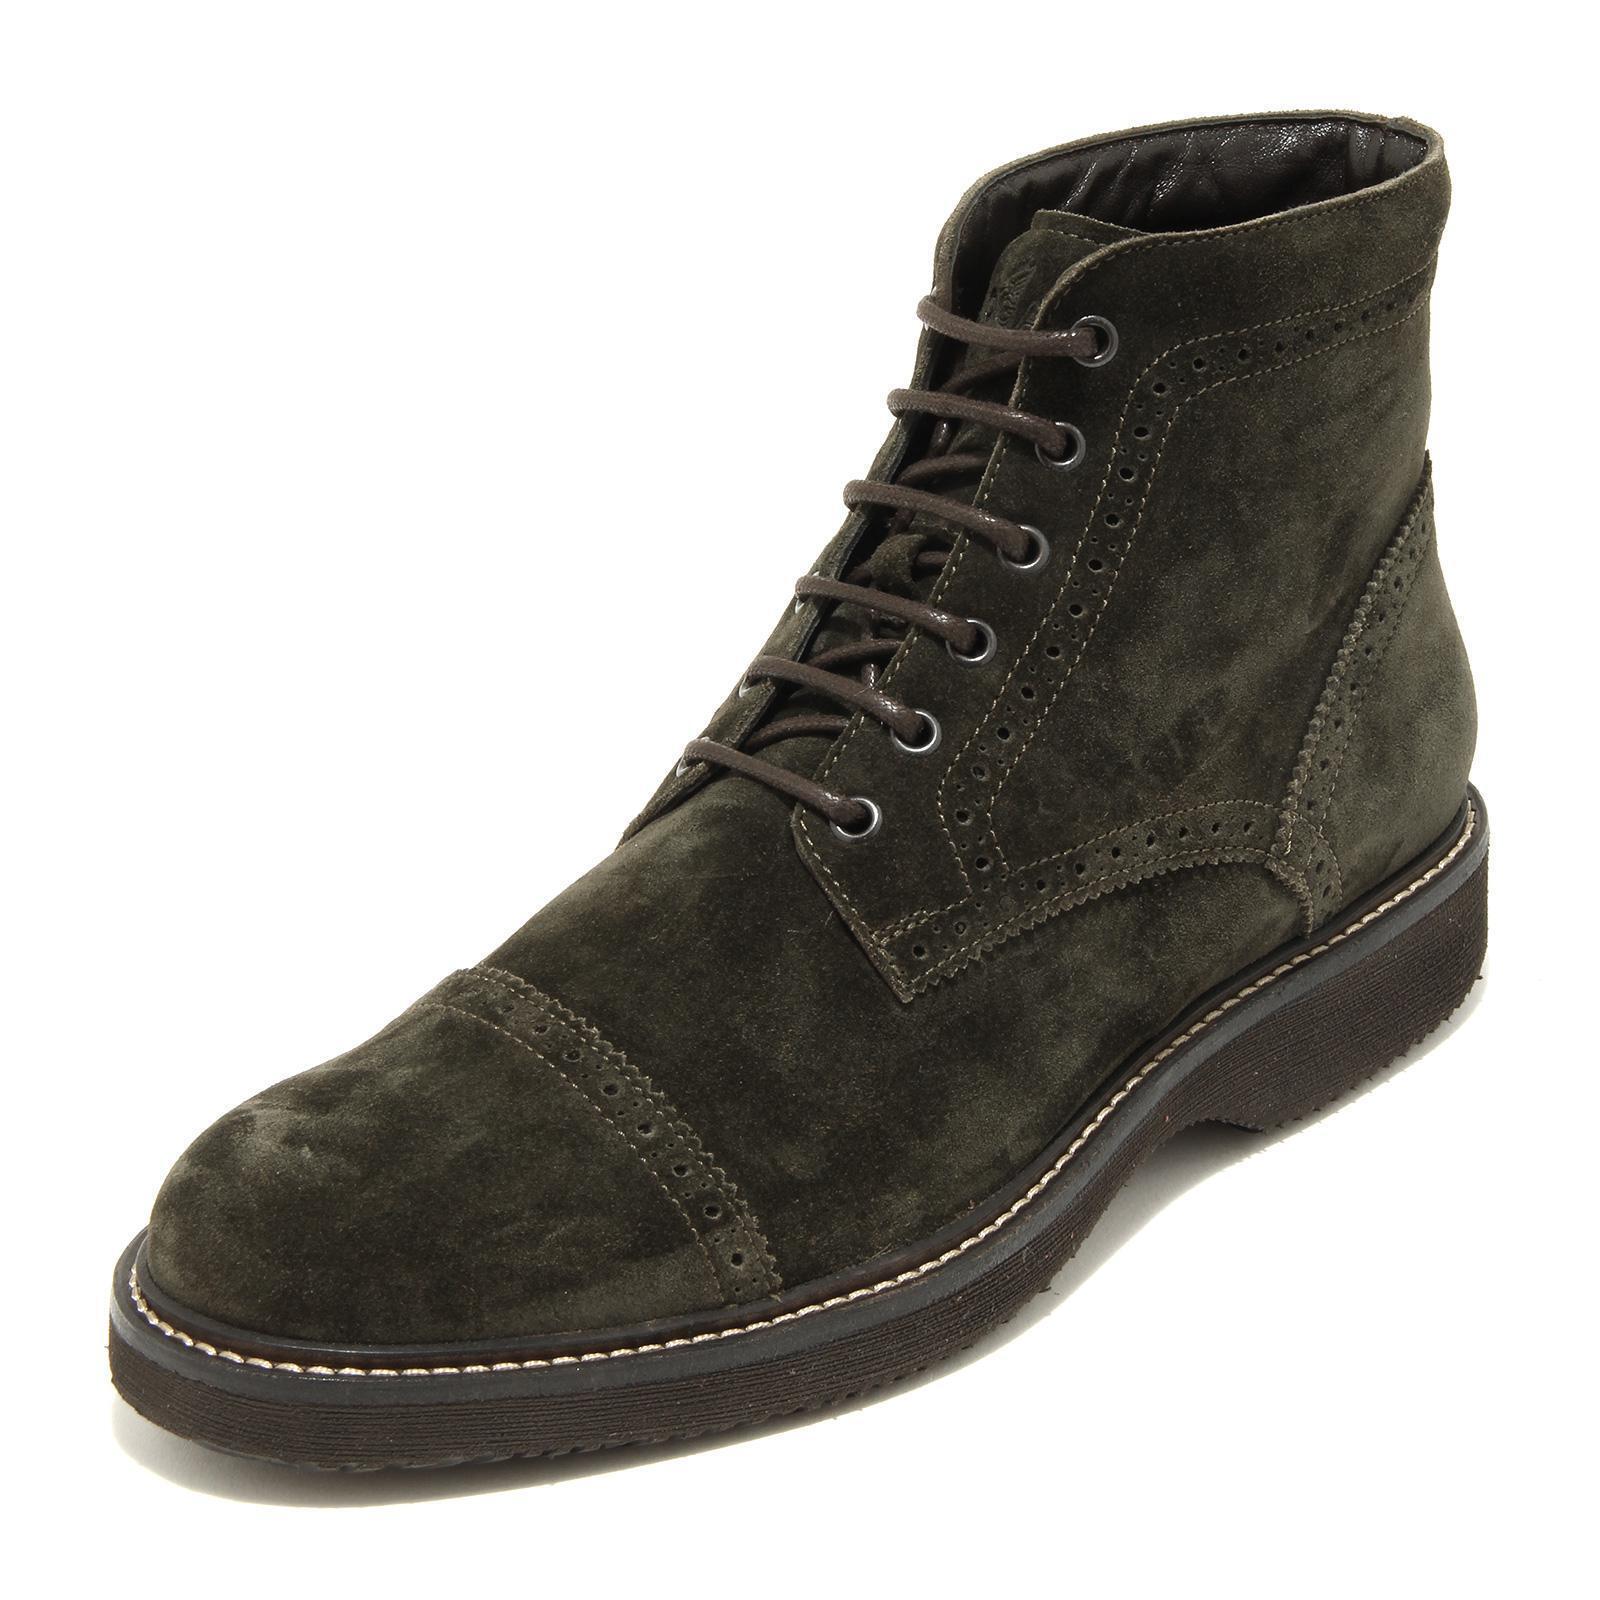 4391G polacchino anfibio uomo verde uomo HOGAN route bucature scarpa uomo verde boots schuhe ab0a91